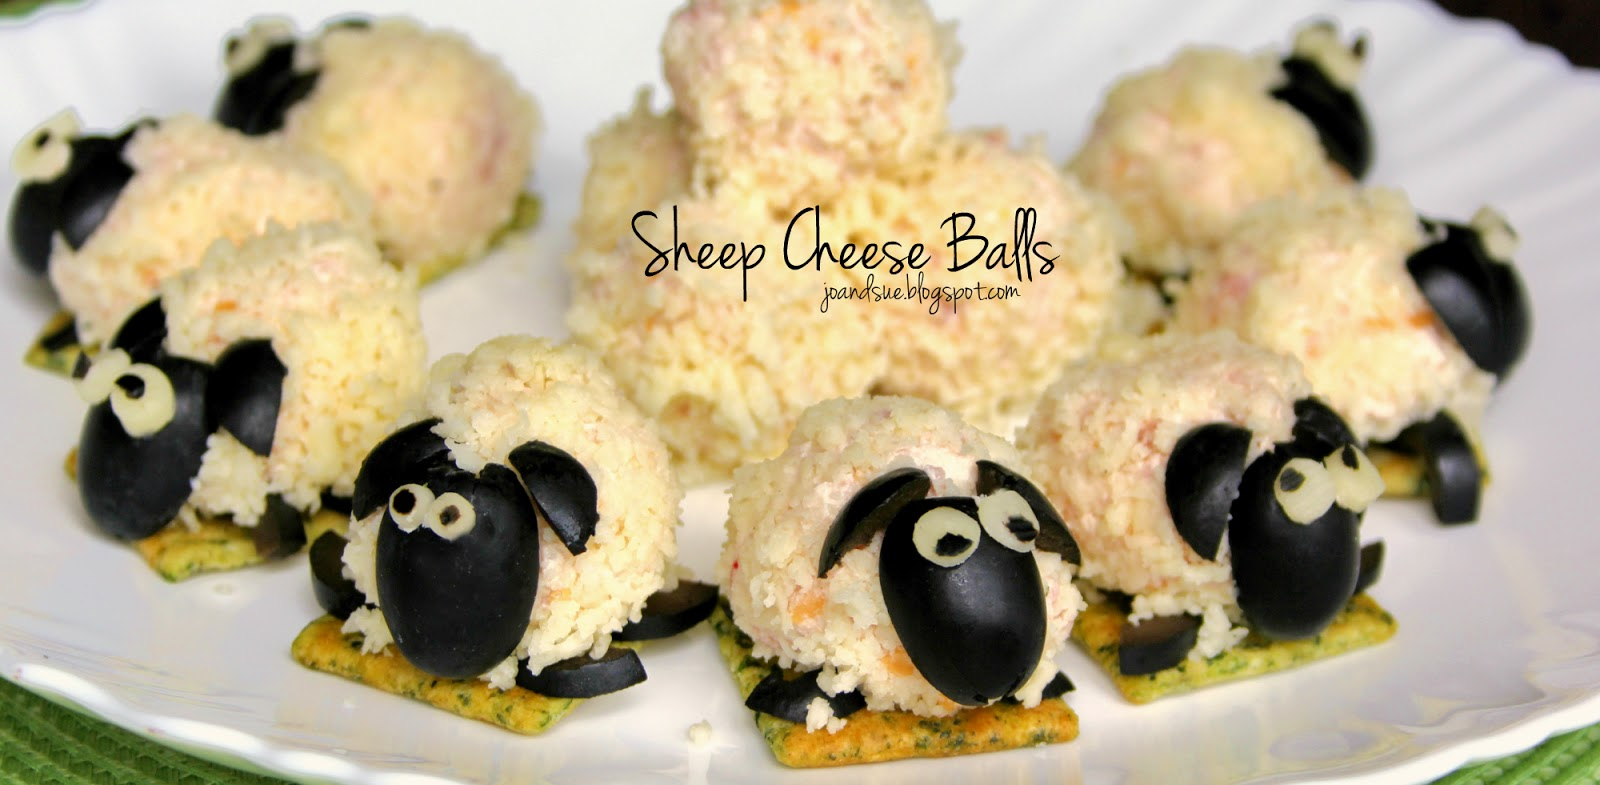 Jo and Sue: Sheep Cheese Balls